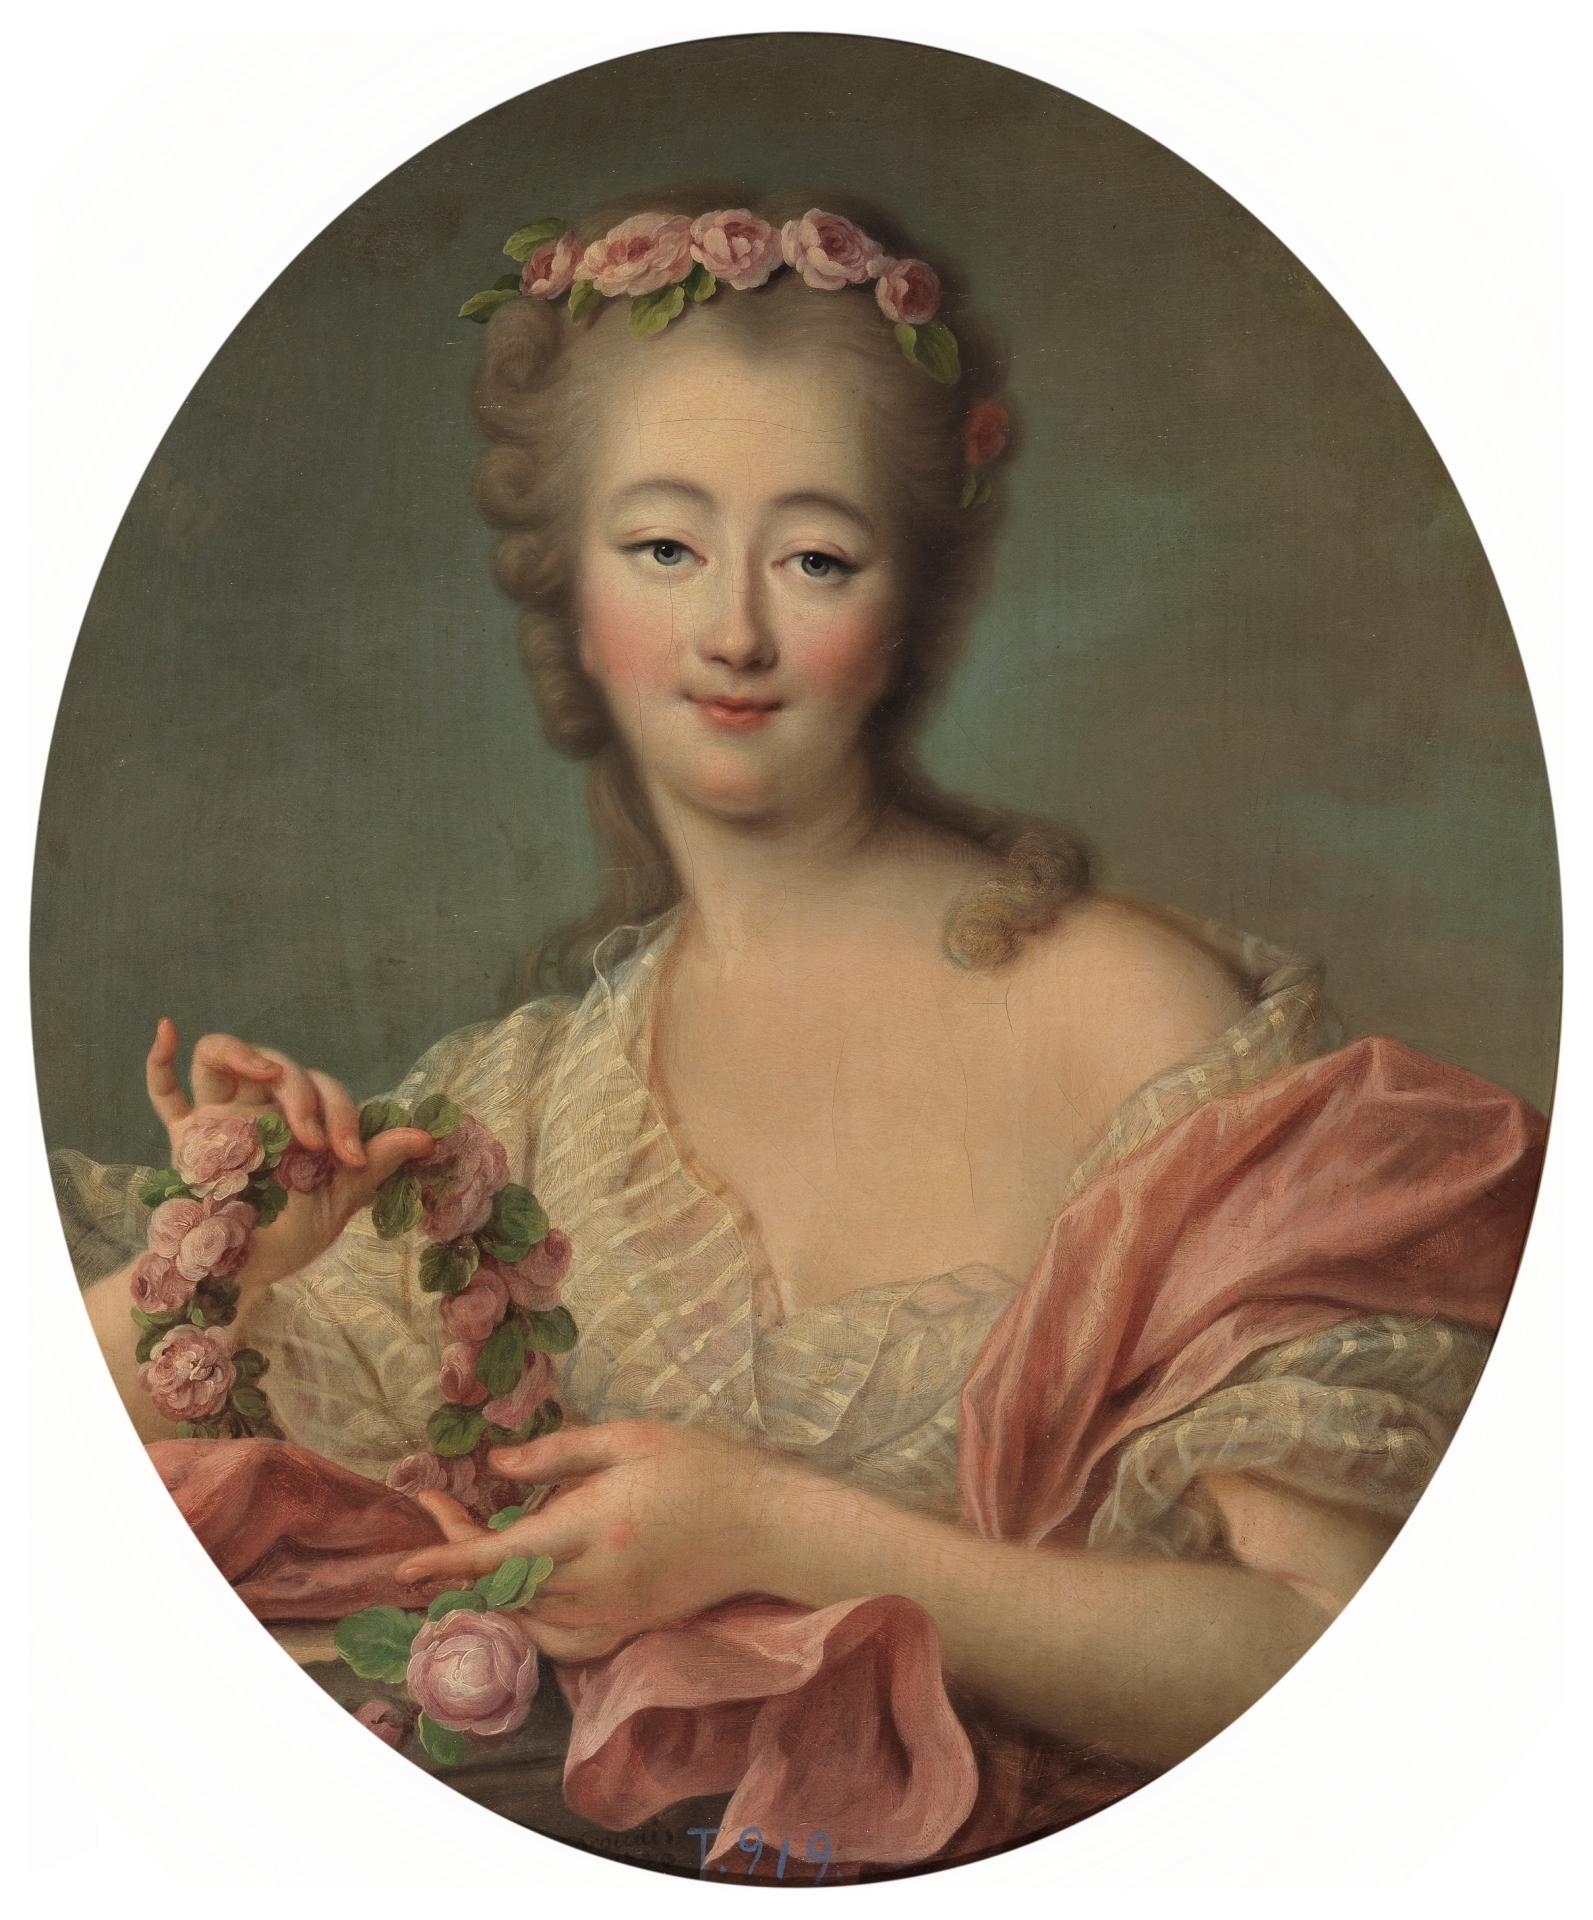 Fichier:Madame du barry.jpg — Wikipédia